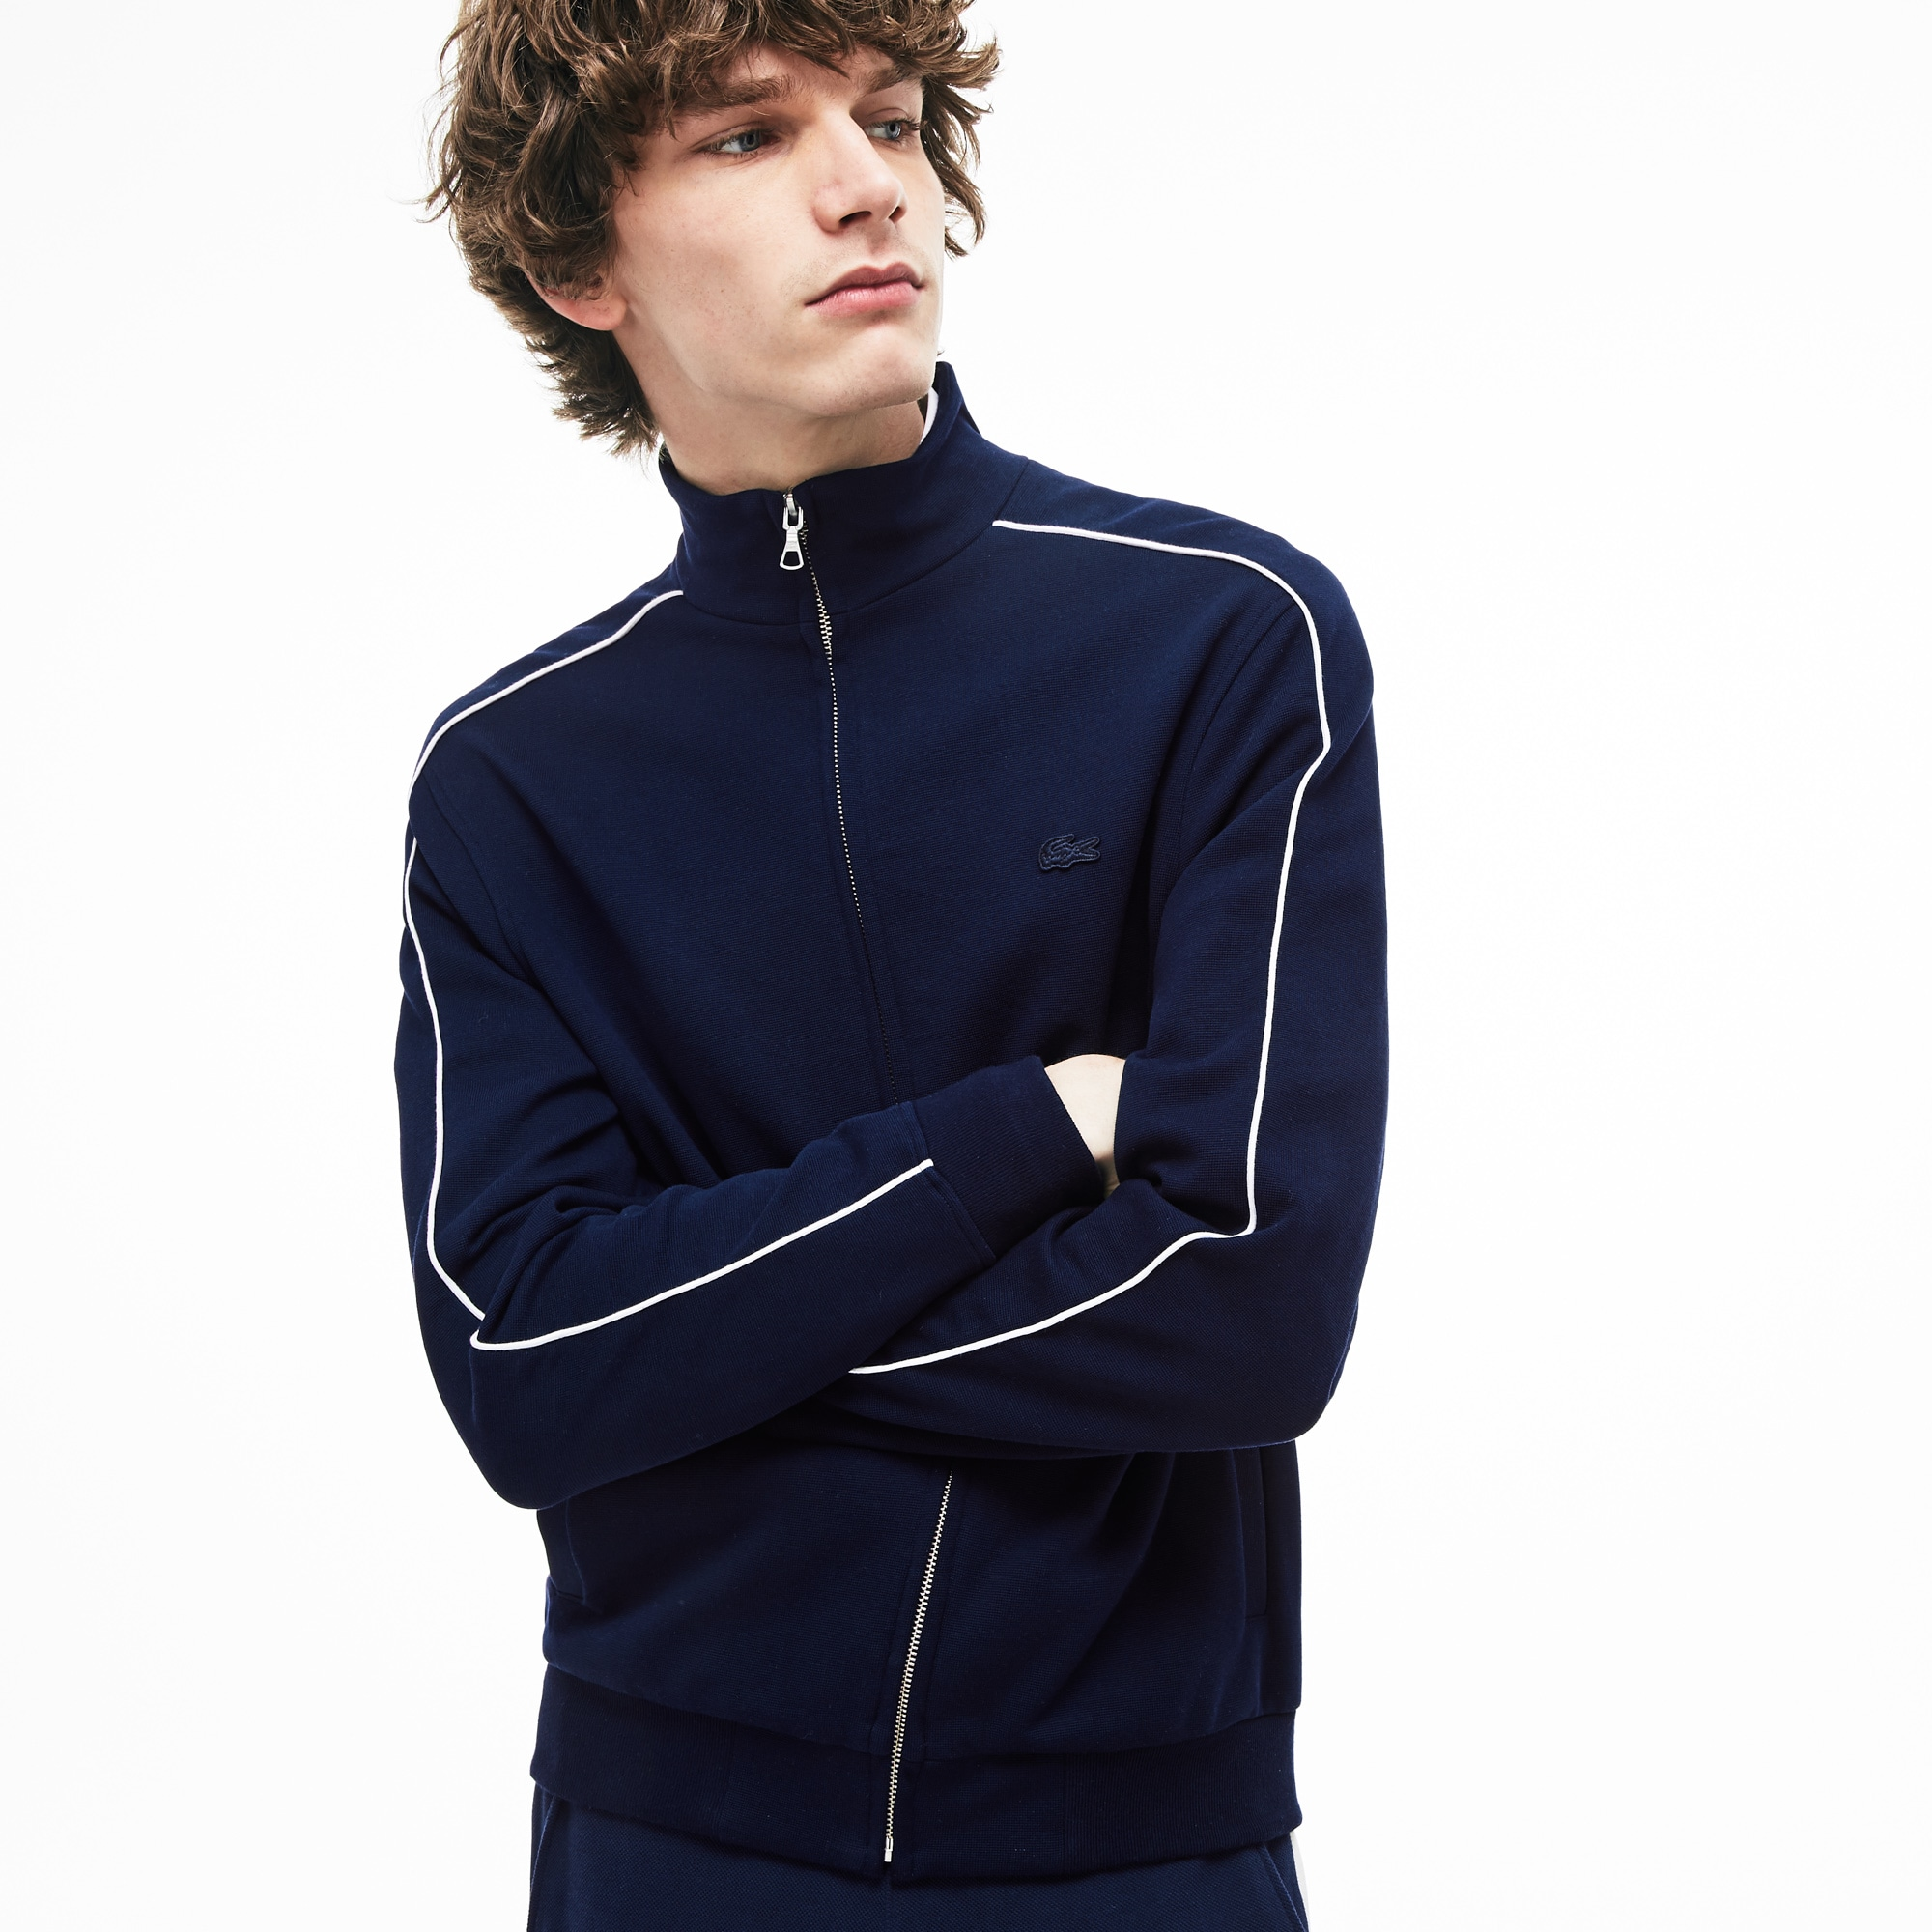 eb785e8572 Sweatshirt zippé en coton milano avec bandes contrastées